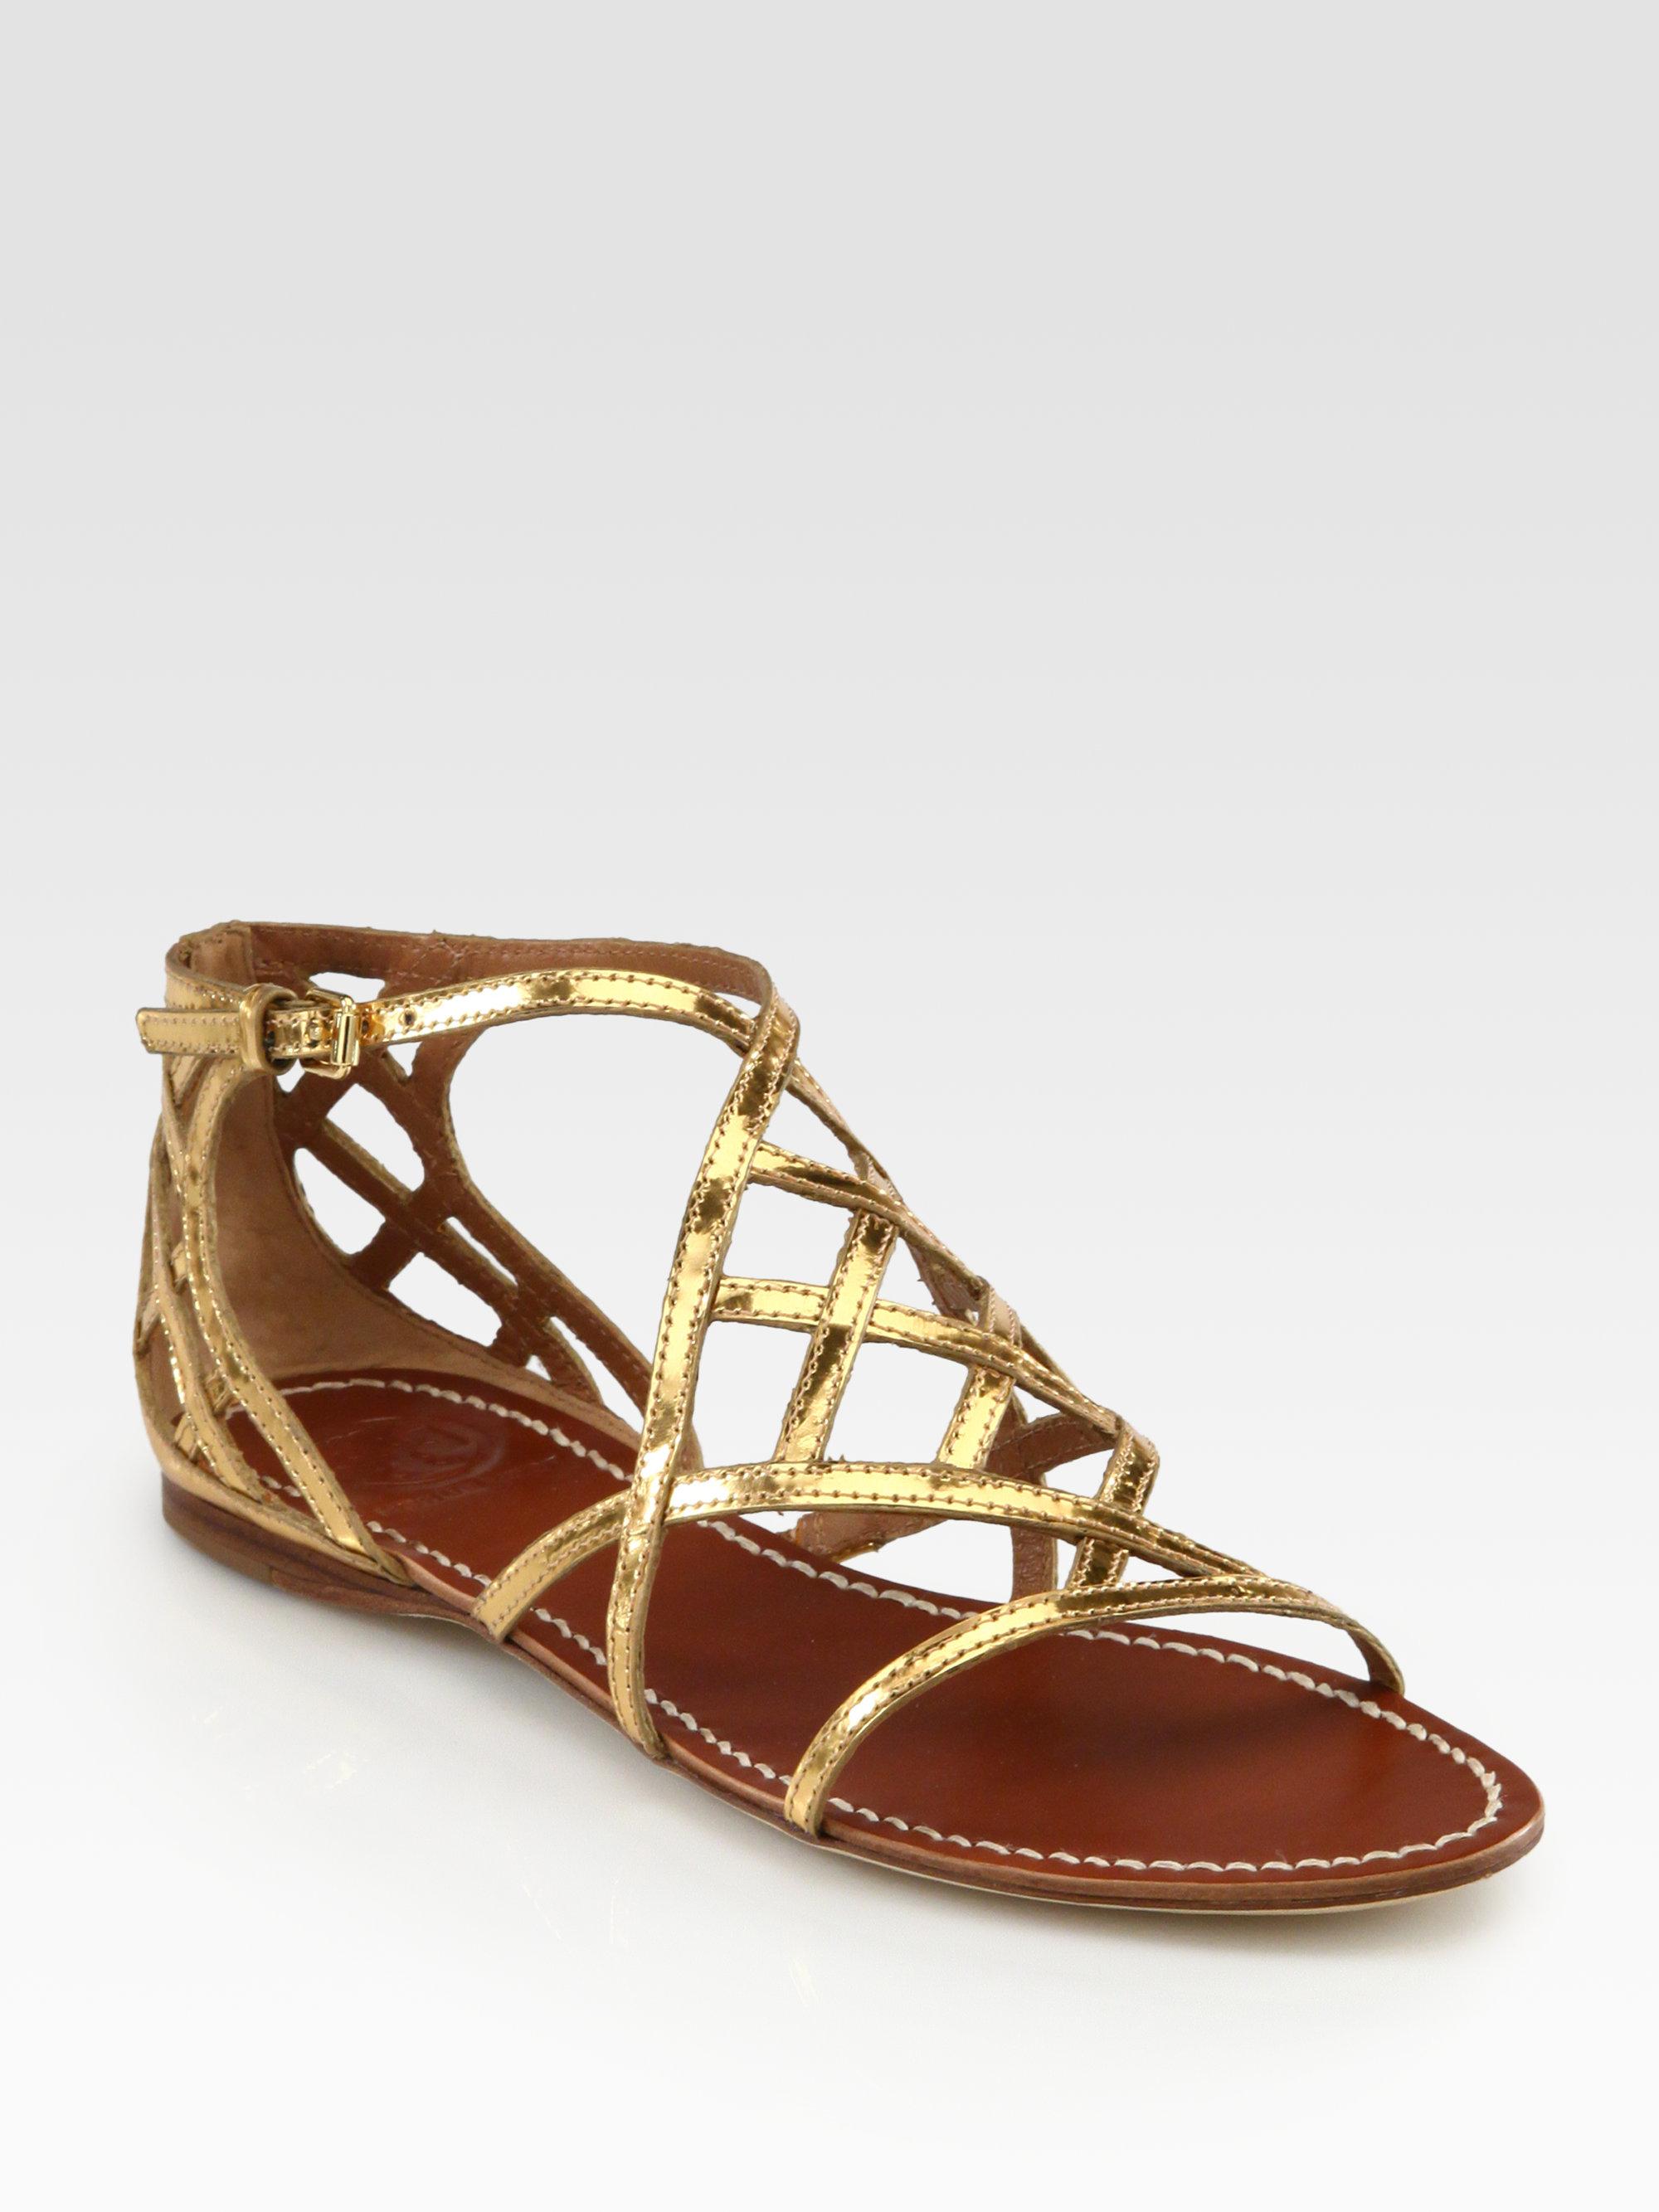 Tory burch Amalie Metallic Leather Sandals in Metallic